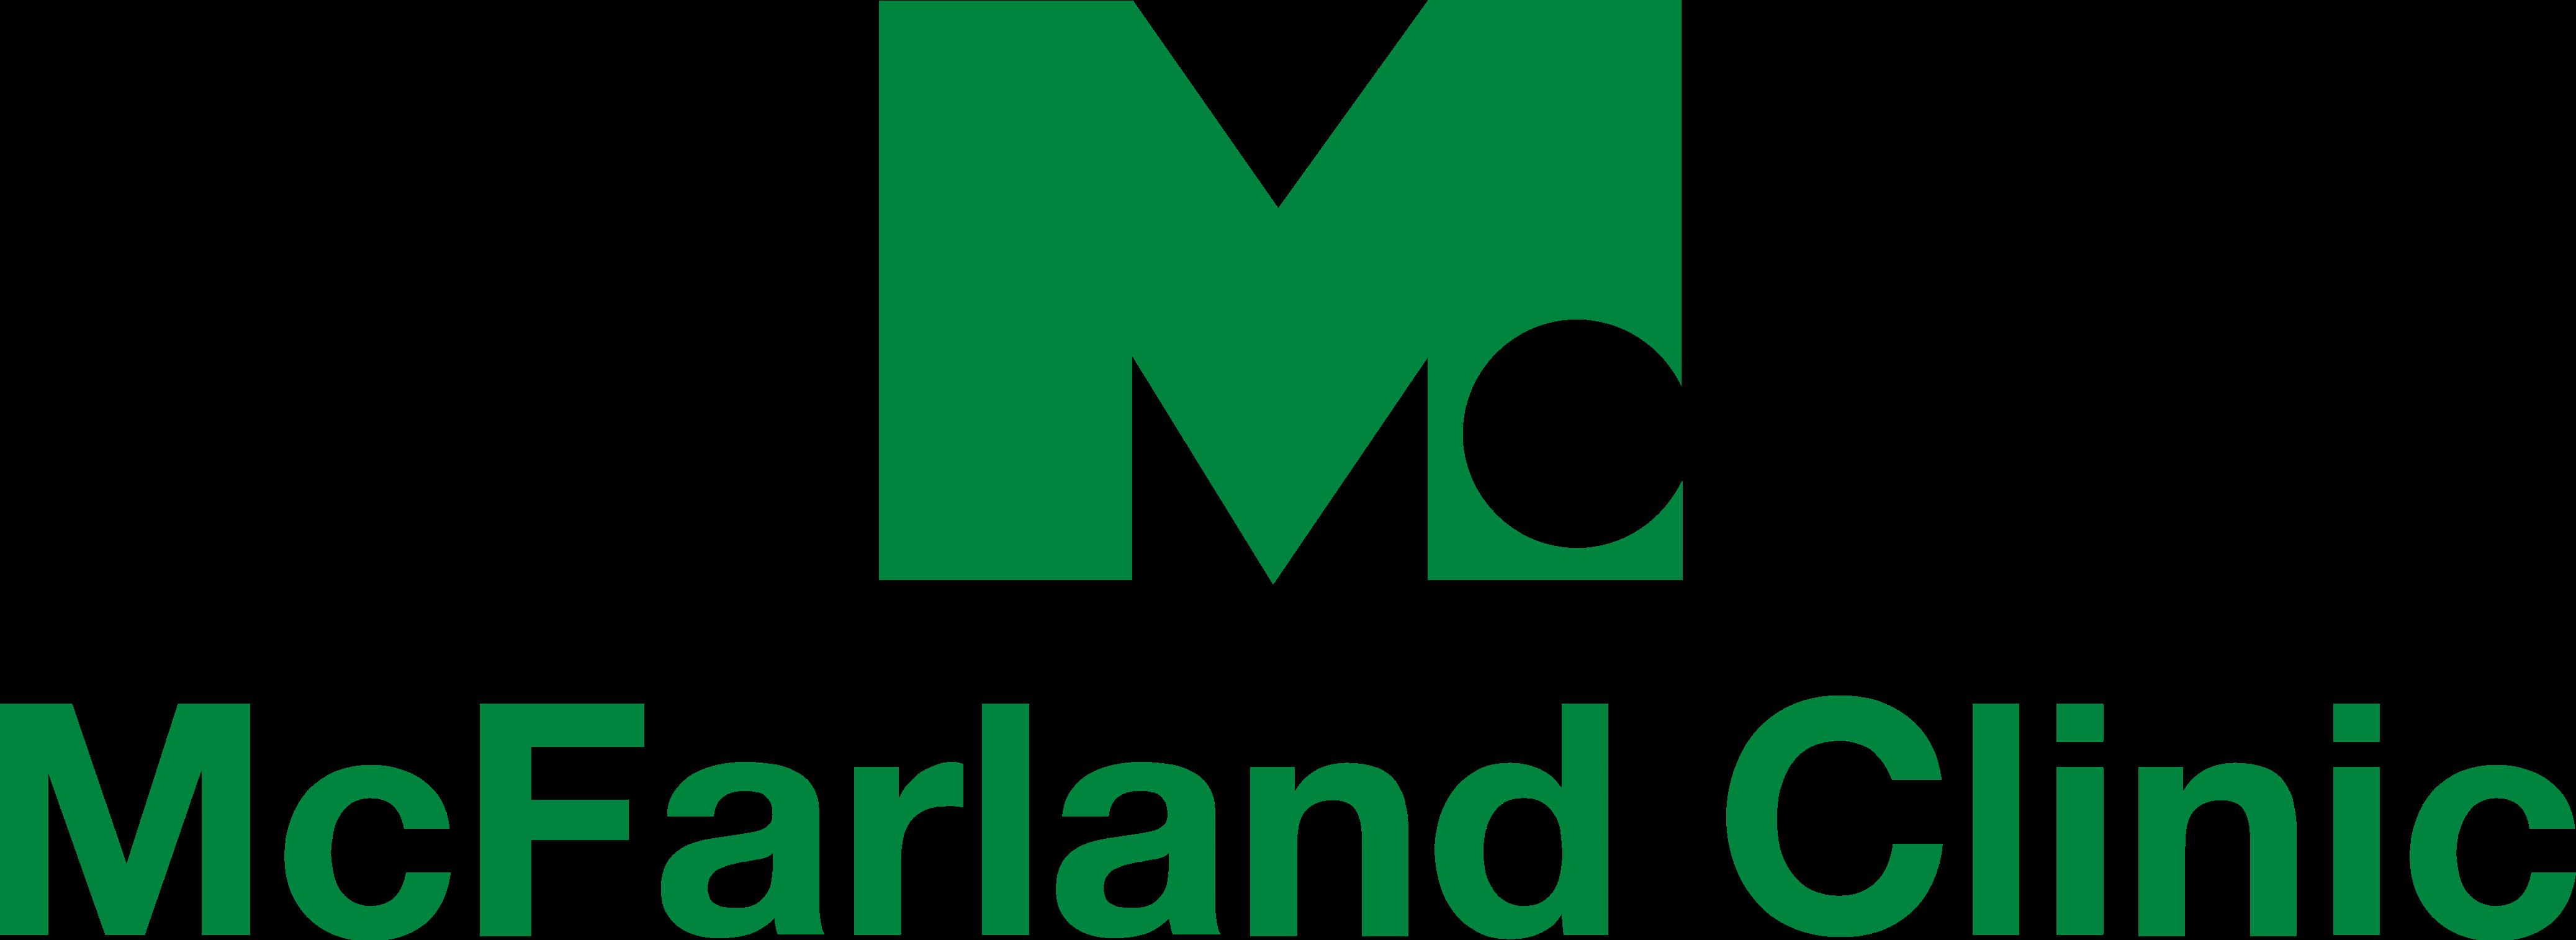 McFarland_Clinic_logo